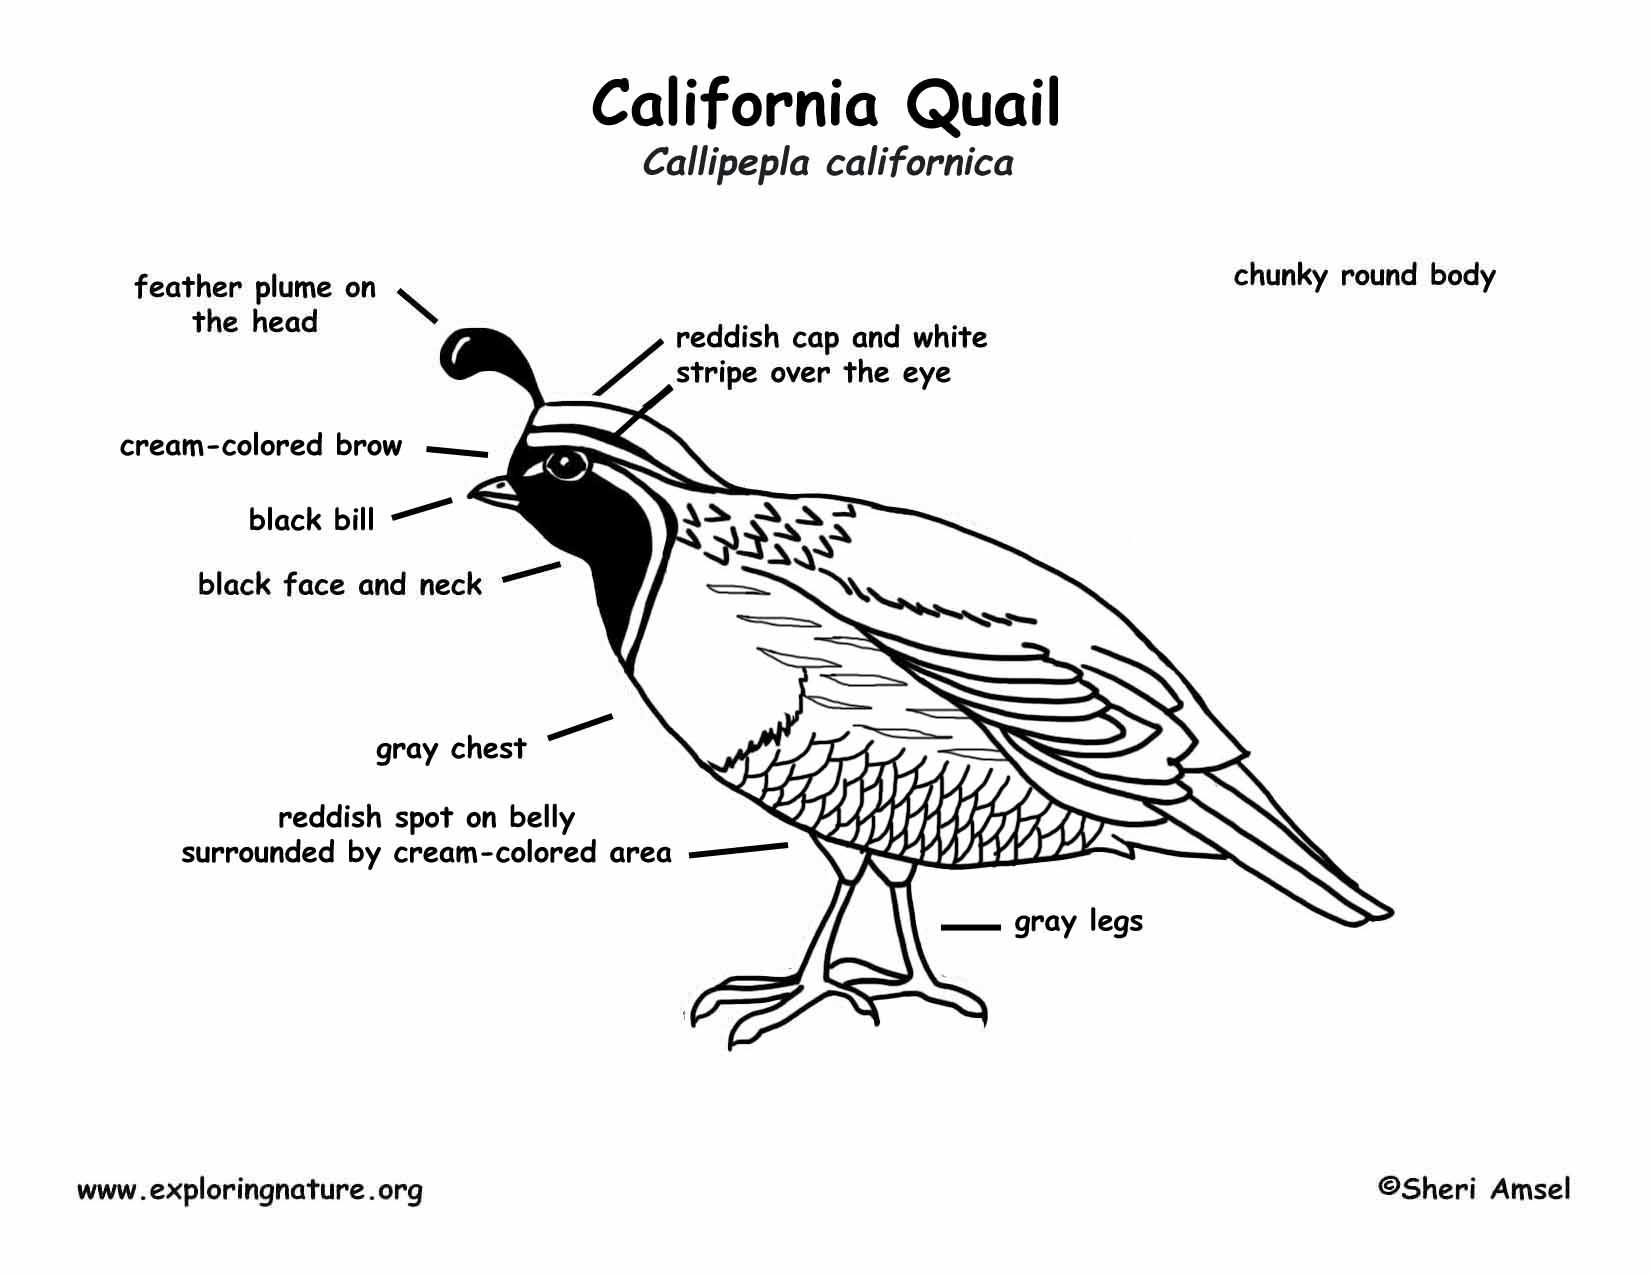 pigeon dissection diagram bmw e46 wiring 2 quail california